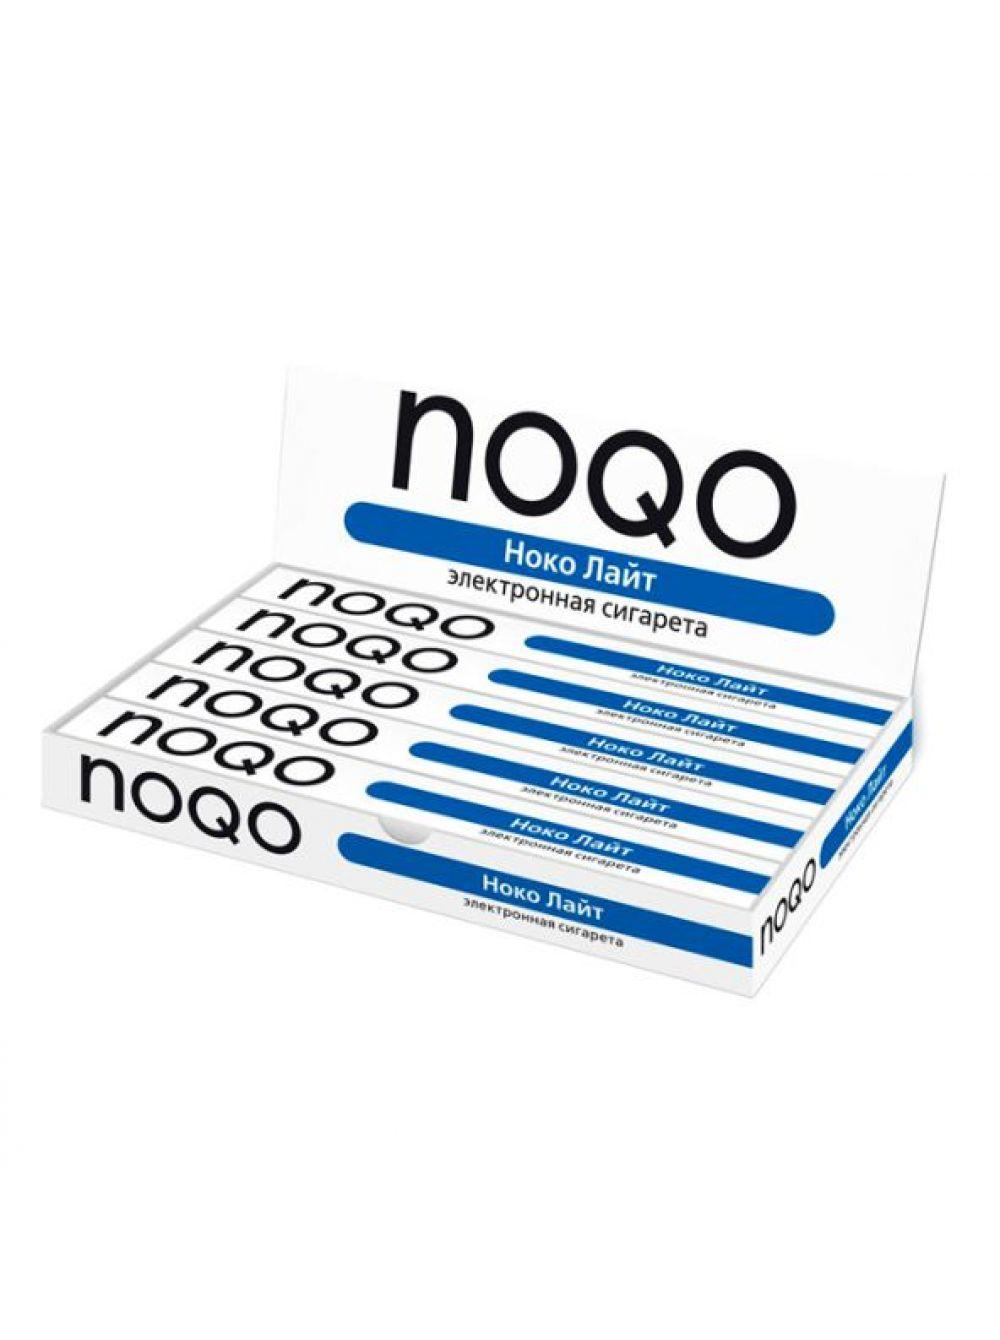 Заказать электронные сигареты noqo купить электронные сигареты в мариуполе